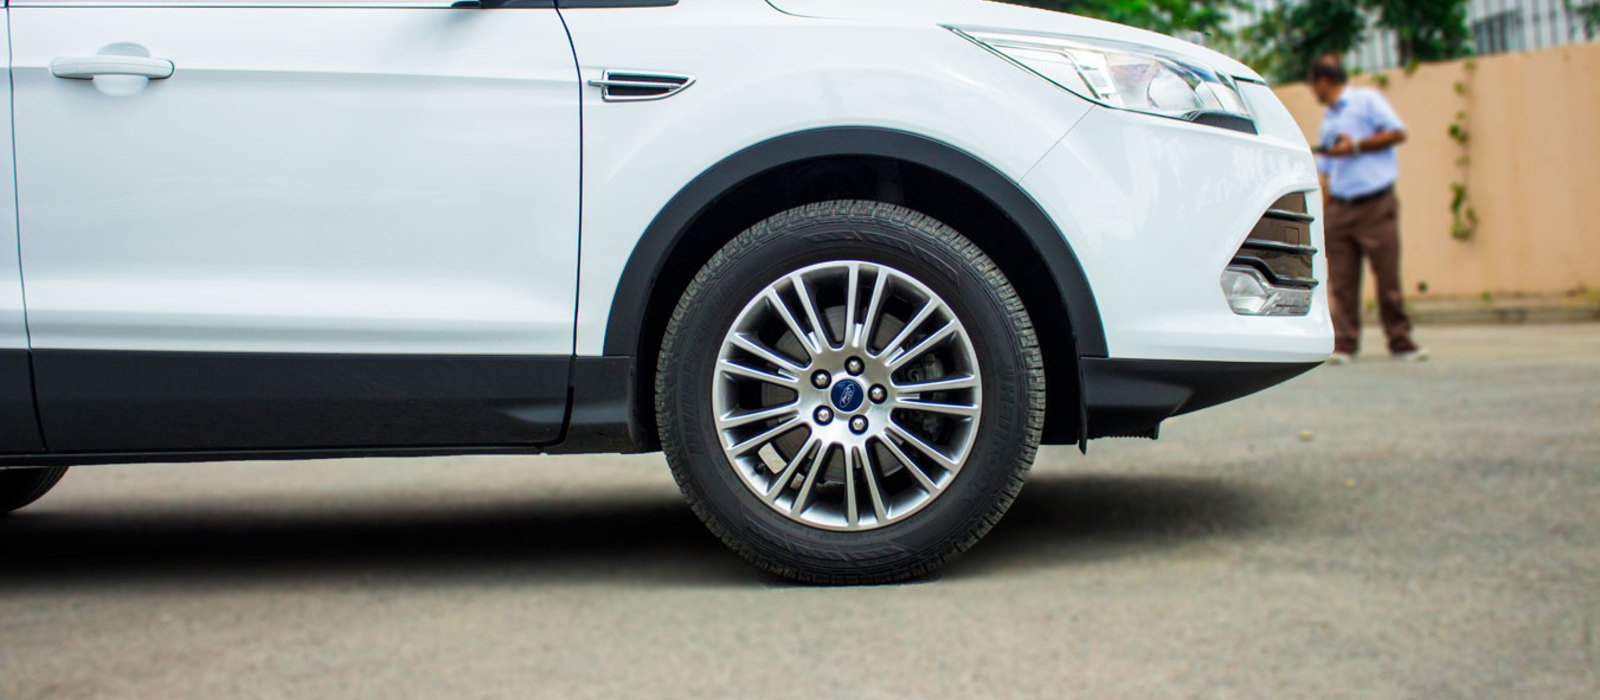 ikinci el araba 2014 Ford Kuga 1.6 EcoBoost Titanium Benzin Otomatik 14000 KM 0